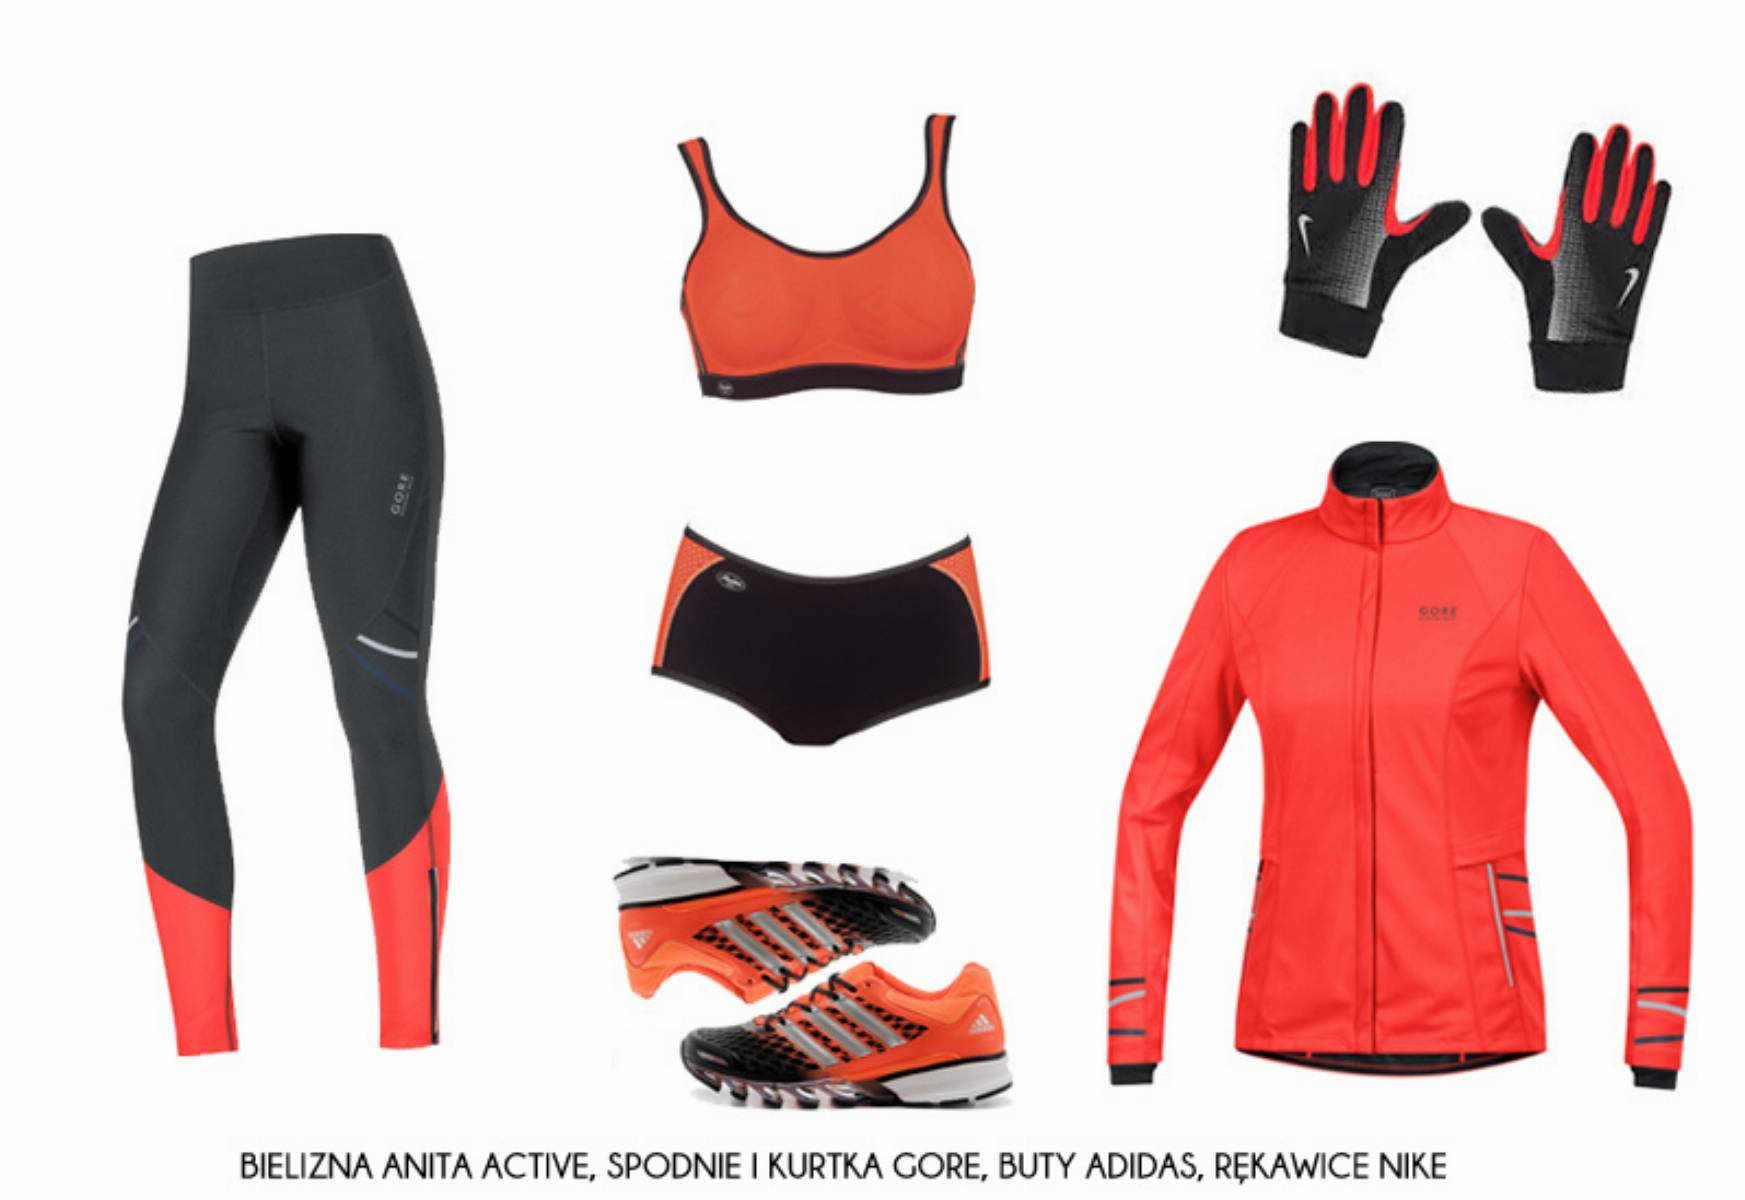 Moda na bieganie AVITA ACTIVE (3)